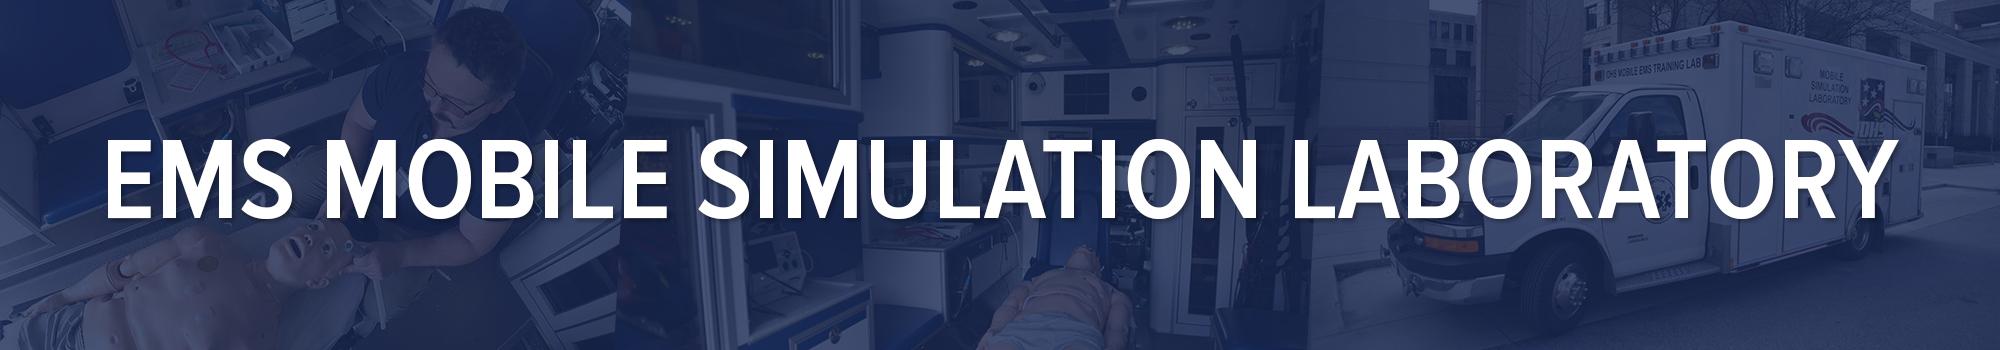 DHS: EMS Mobile Simulation Laboratory